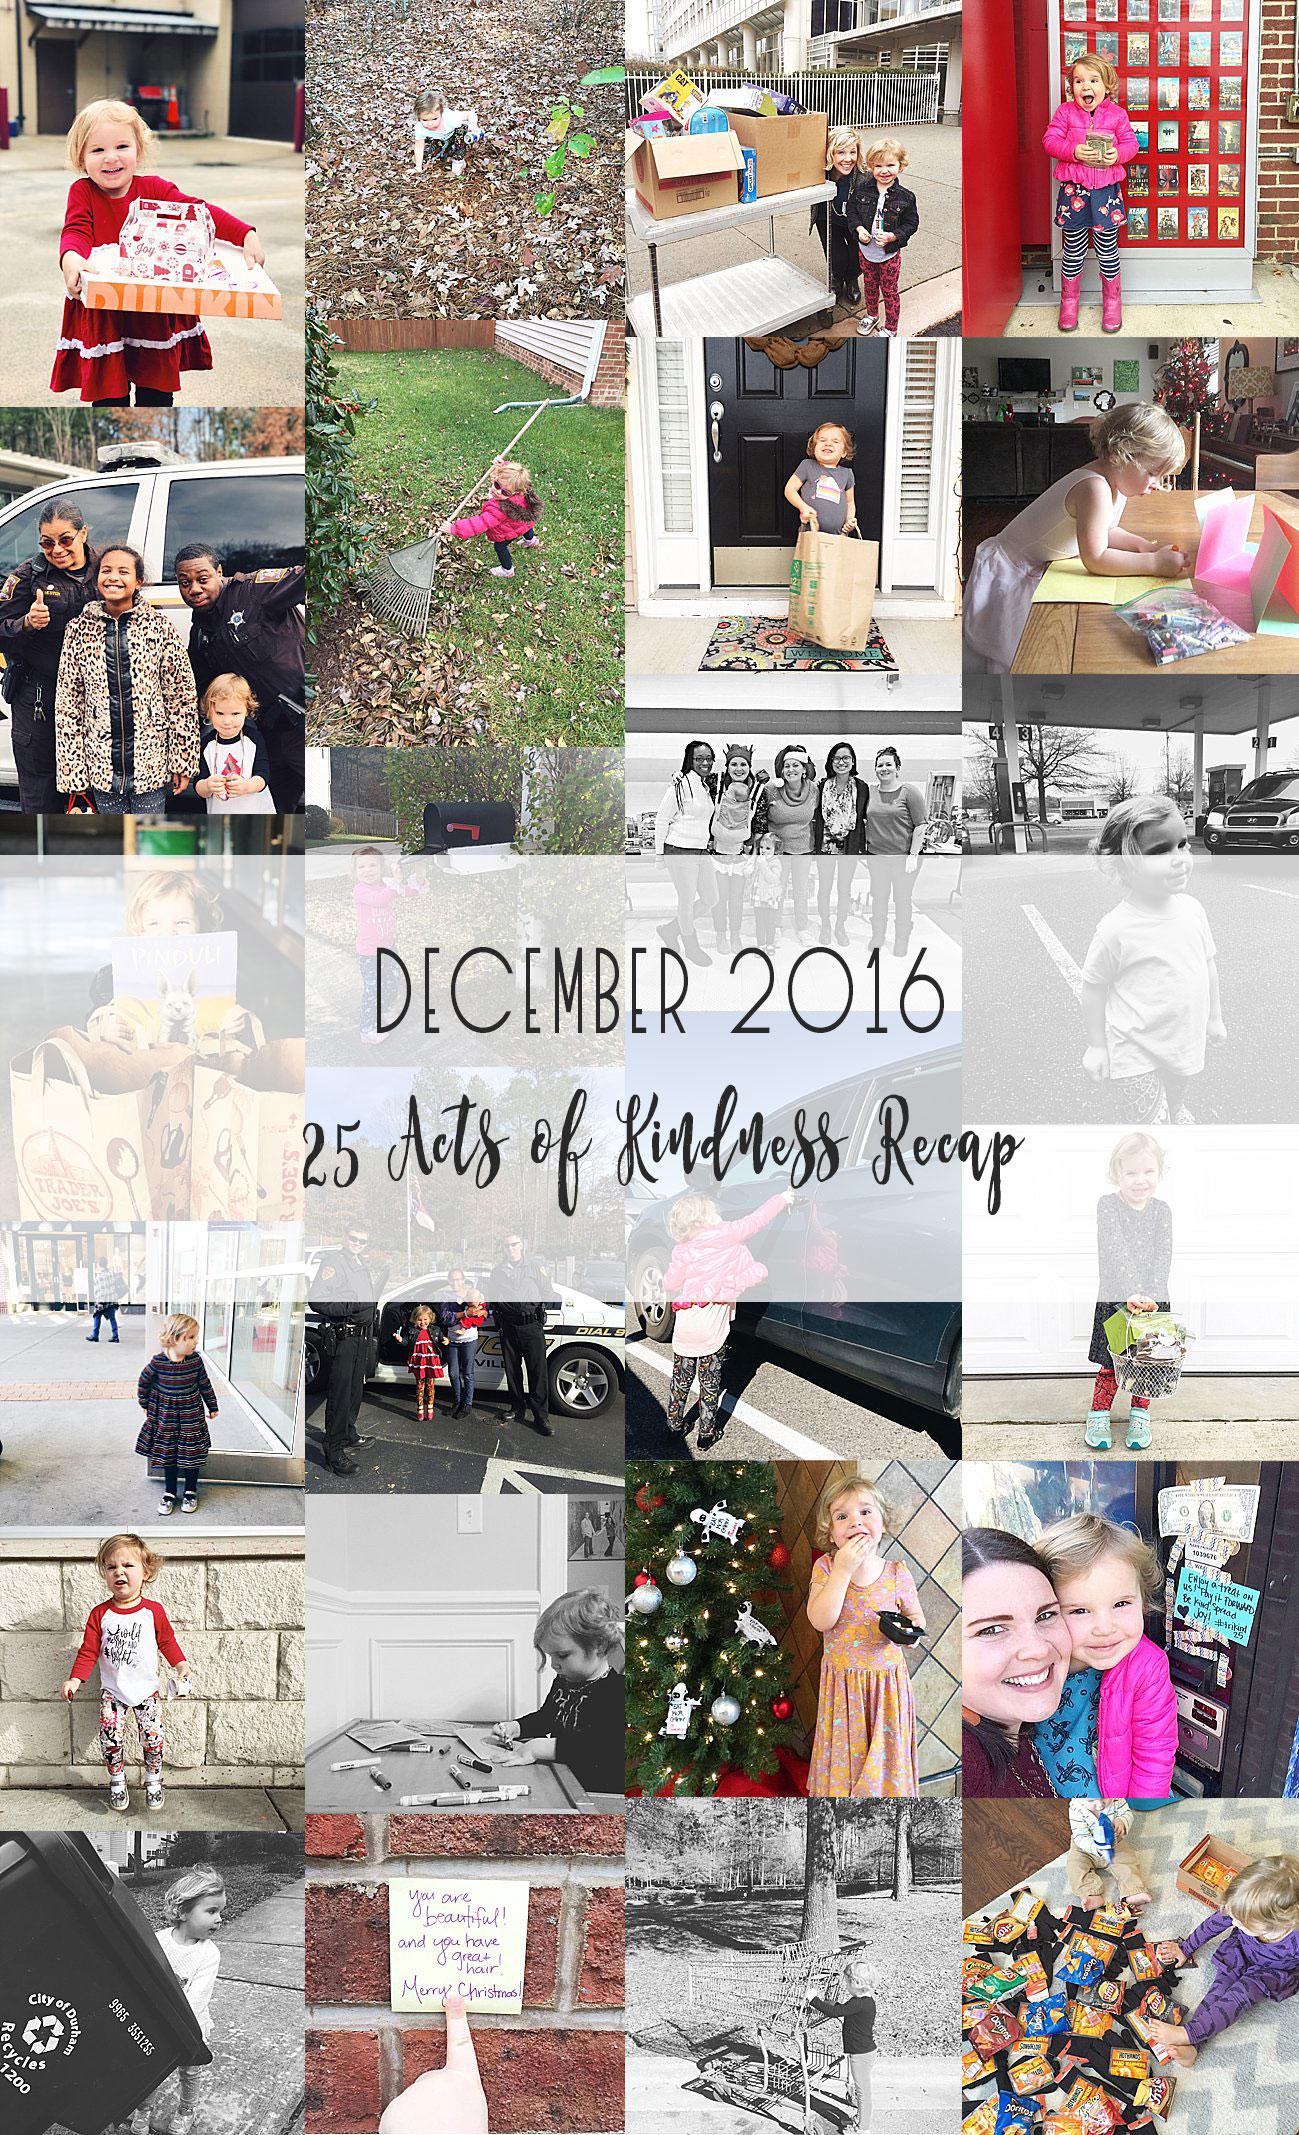 25 Random Acts of Christmas Kindness - Kindness Advent 2016 | Recap #trikind25 #kindnessadvent #25daysofkindness (27)